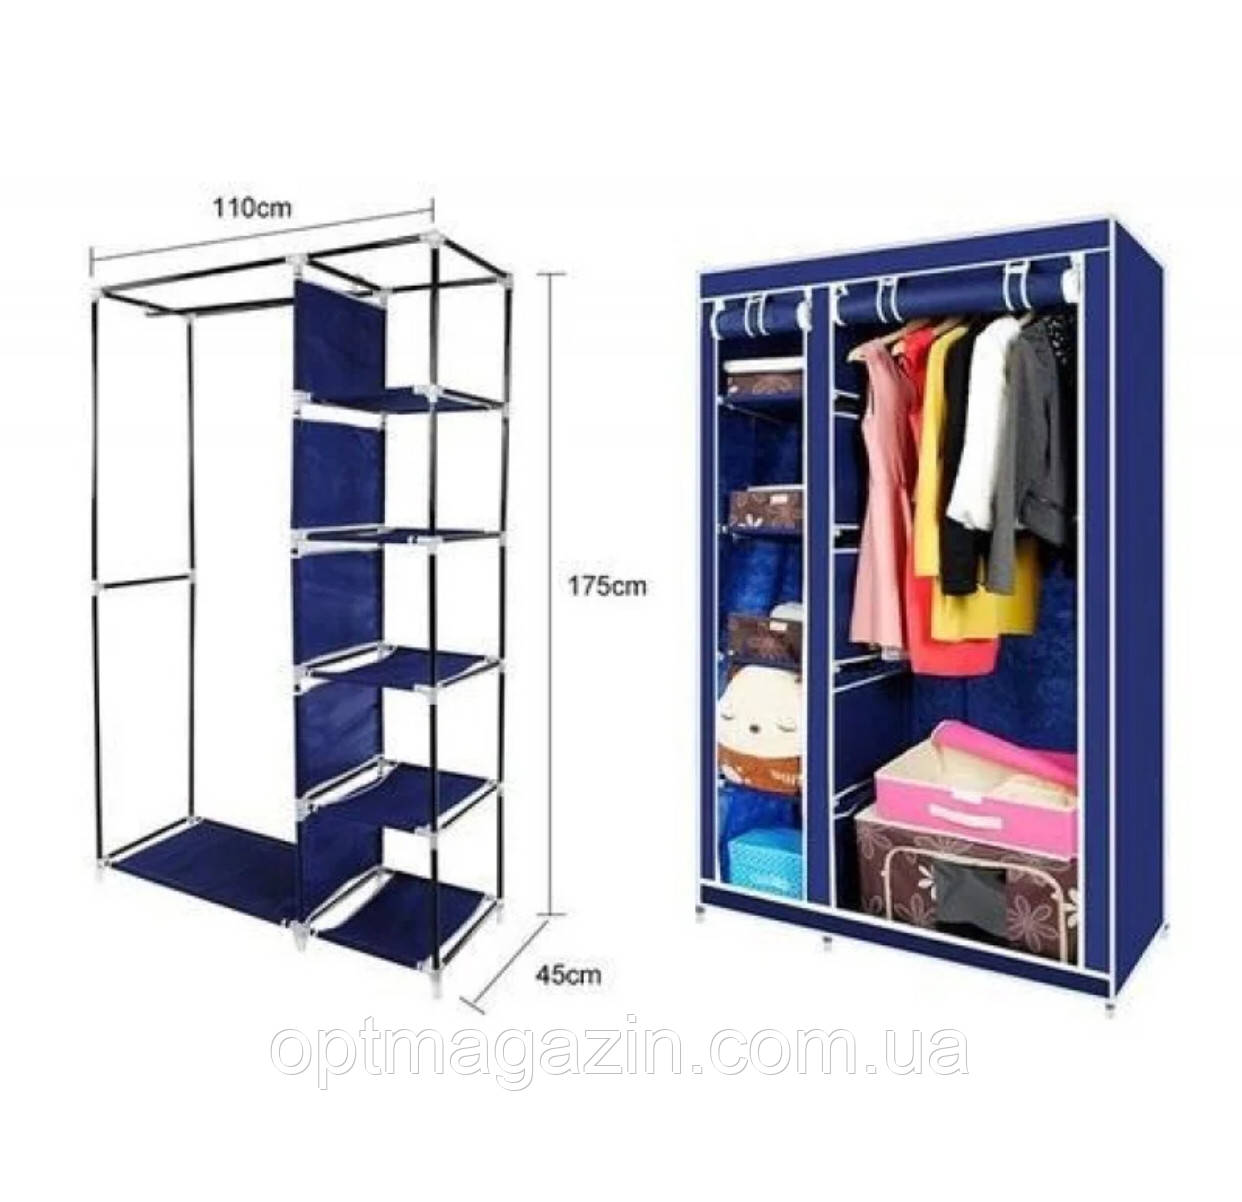 Тканевой шкаф для одежды Clothes Rail With Protective Cover №28109 B-156